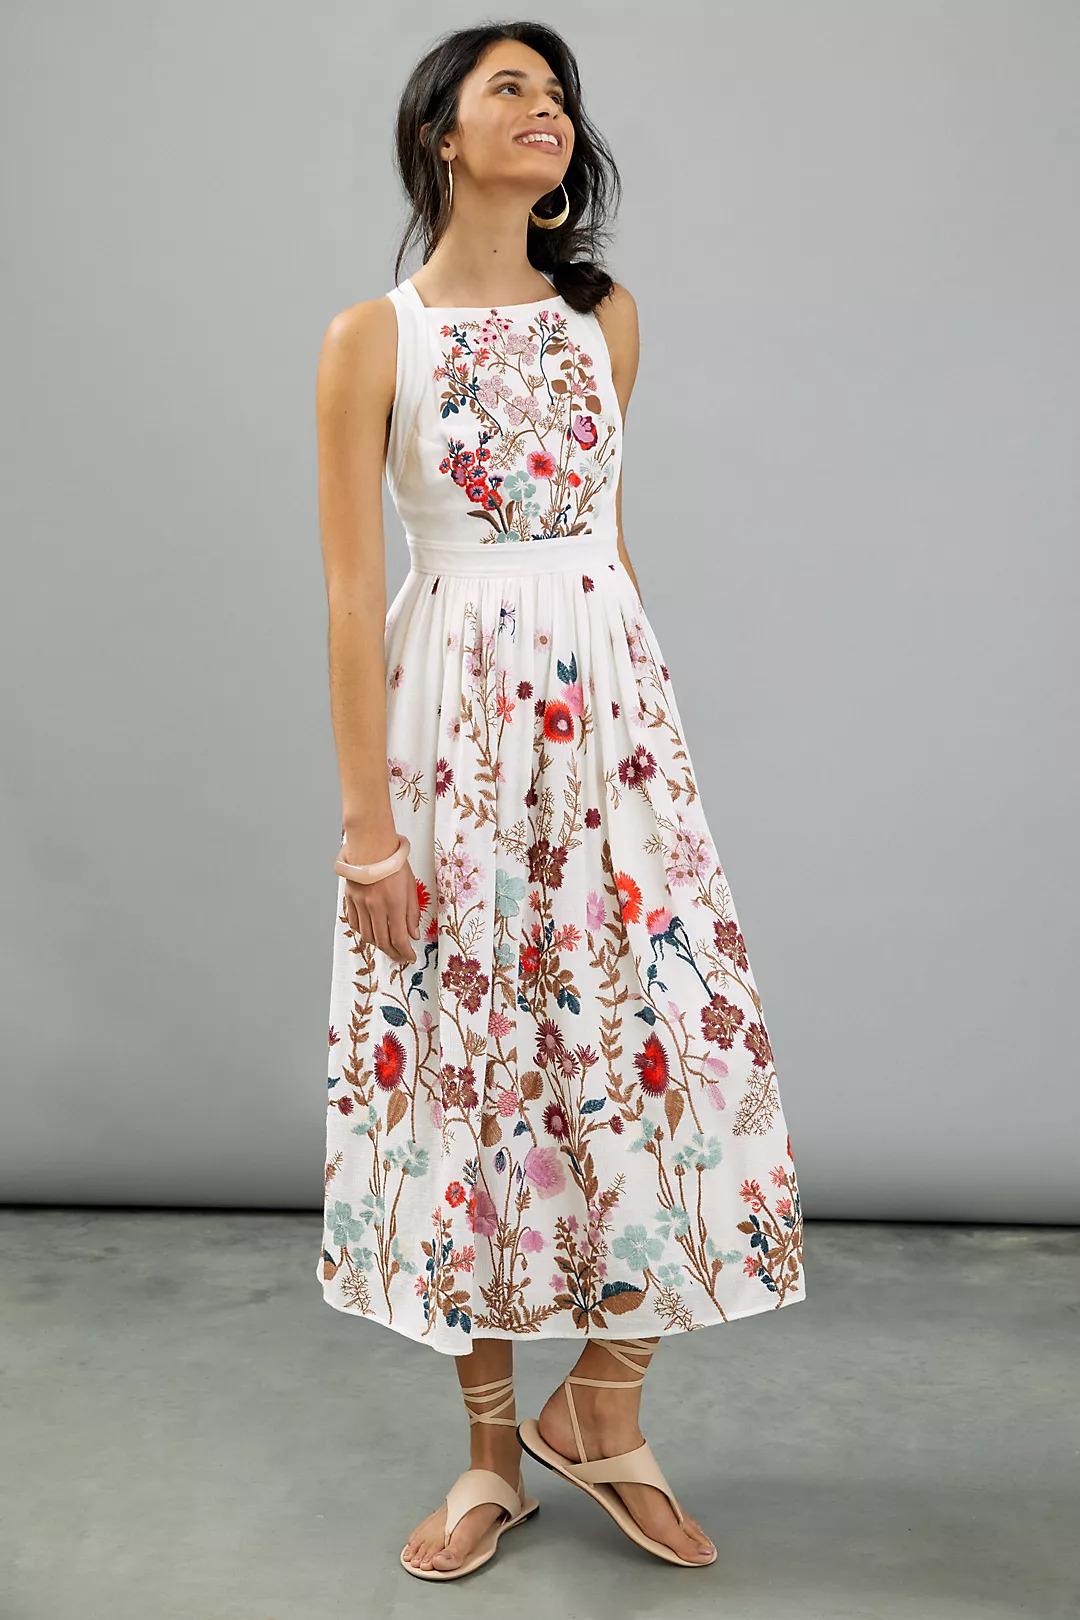 Floral anthropology dress